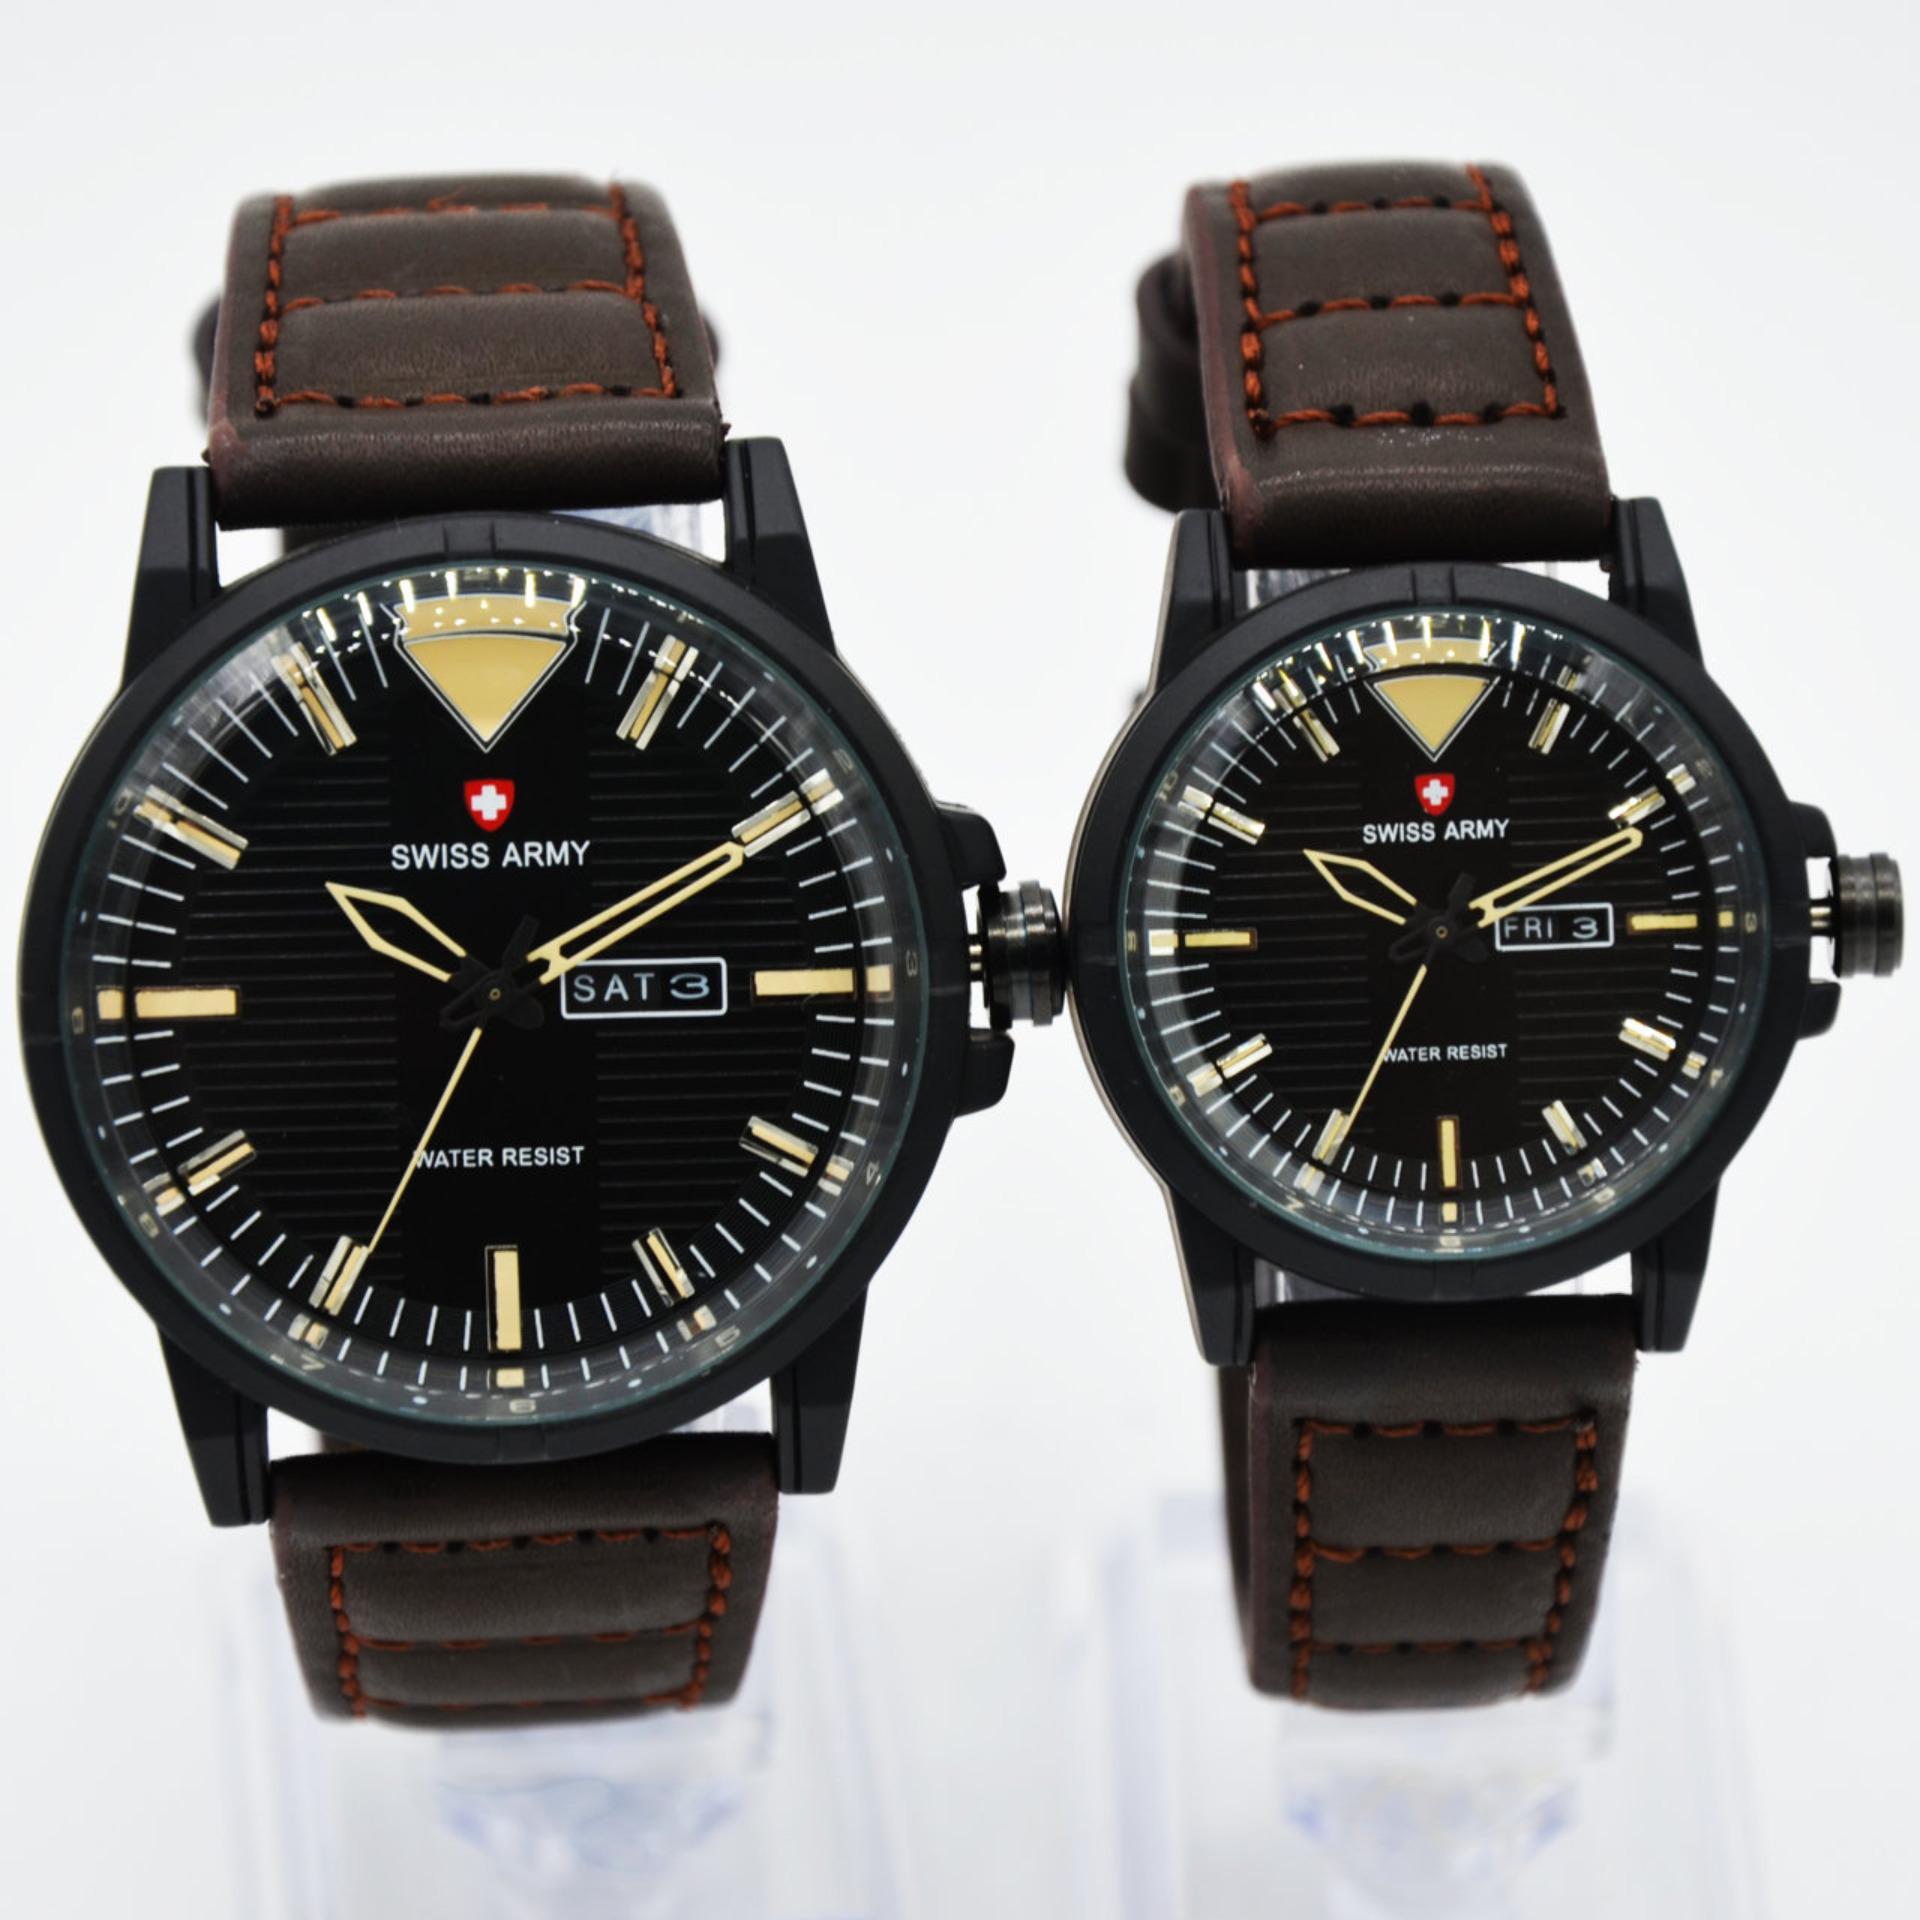 ... Tali Kulit - Hitam - Sa1911Black Gold Swiss Army Couple - SA 1650 - Jam Tangan Kasual Couple - Leather Strap [Black